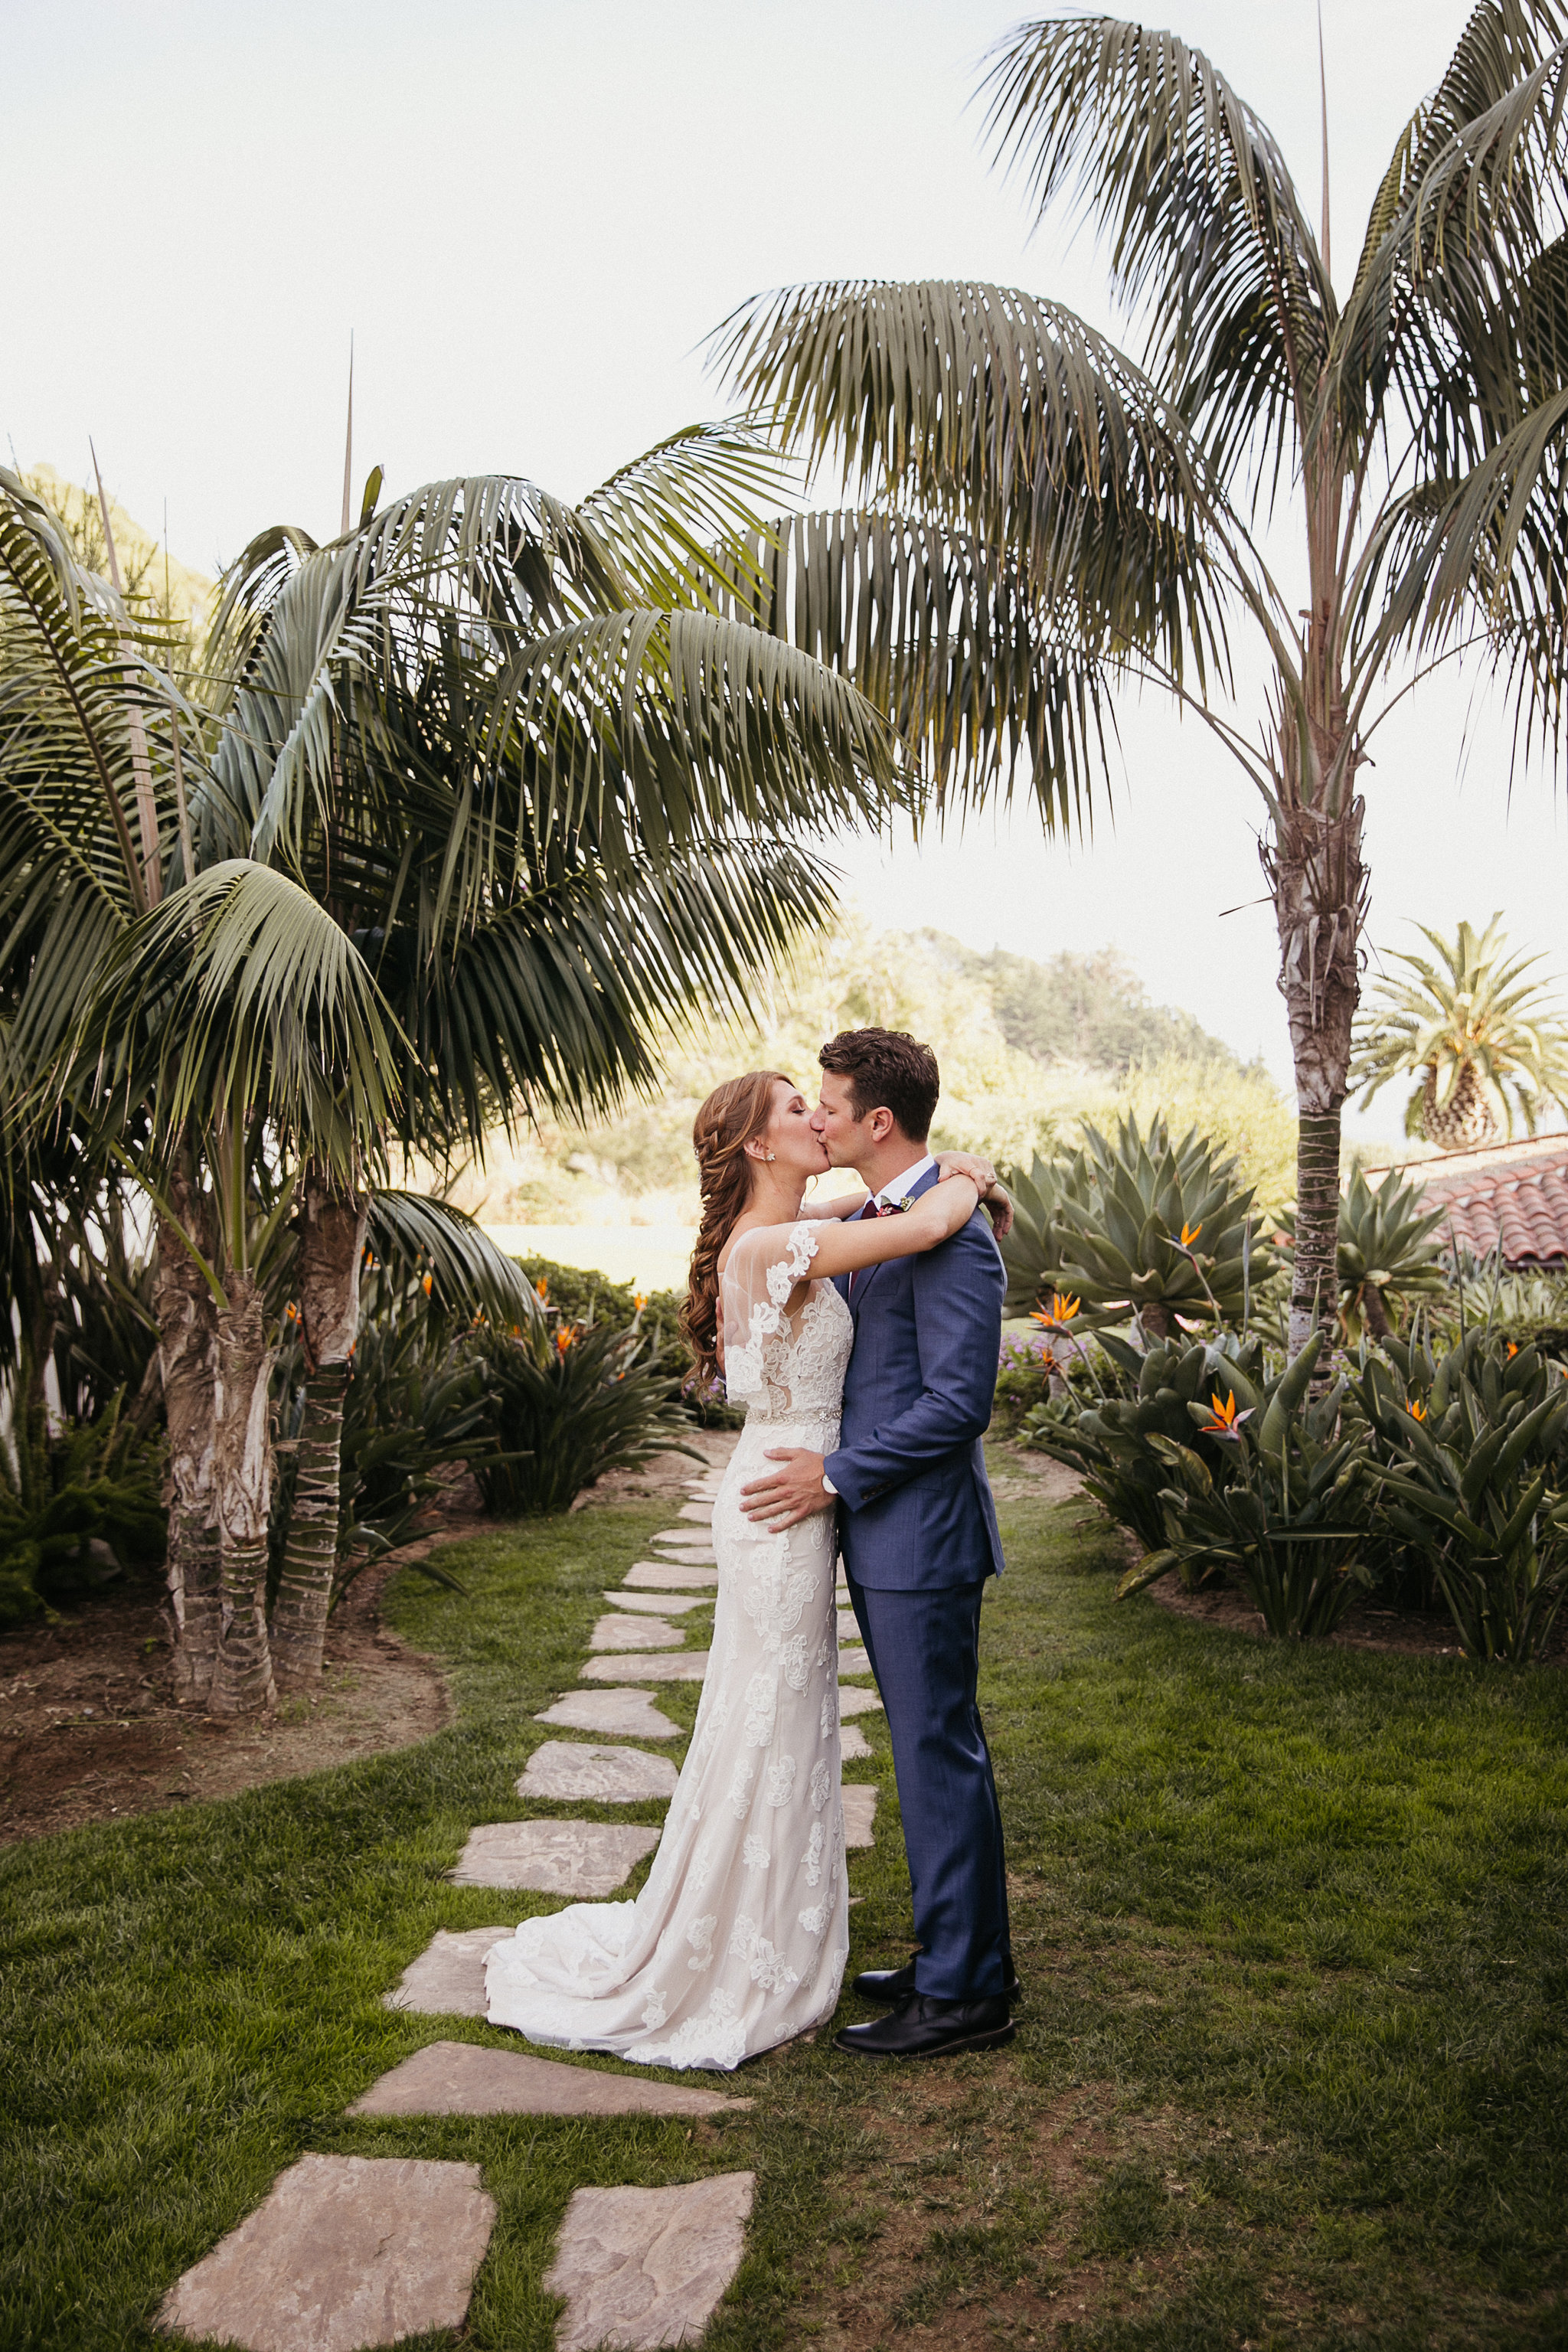 santa-barbara-elopement-wedding-planner-planning-coordinator-day-of-ellwood-bluff-ocean-front-view-bacara-resort-ritz-carlton-porsche-downtown (10).jpg